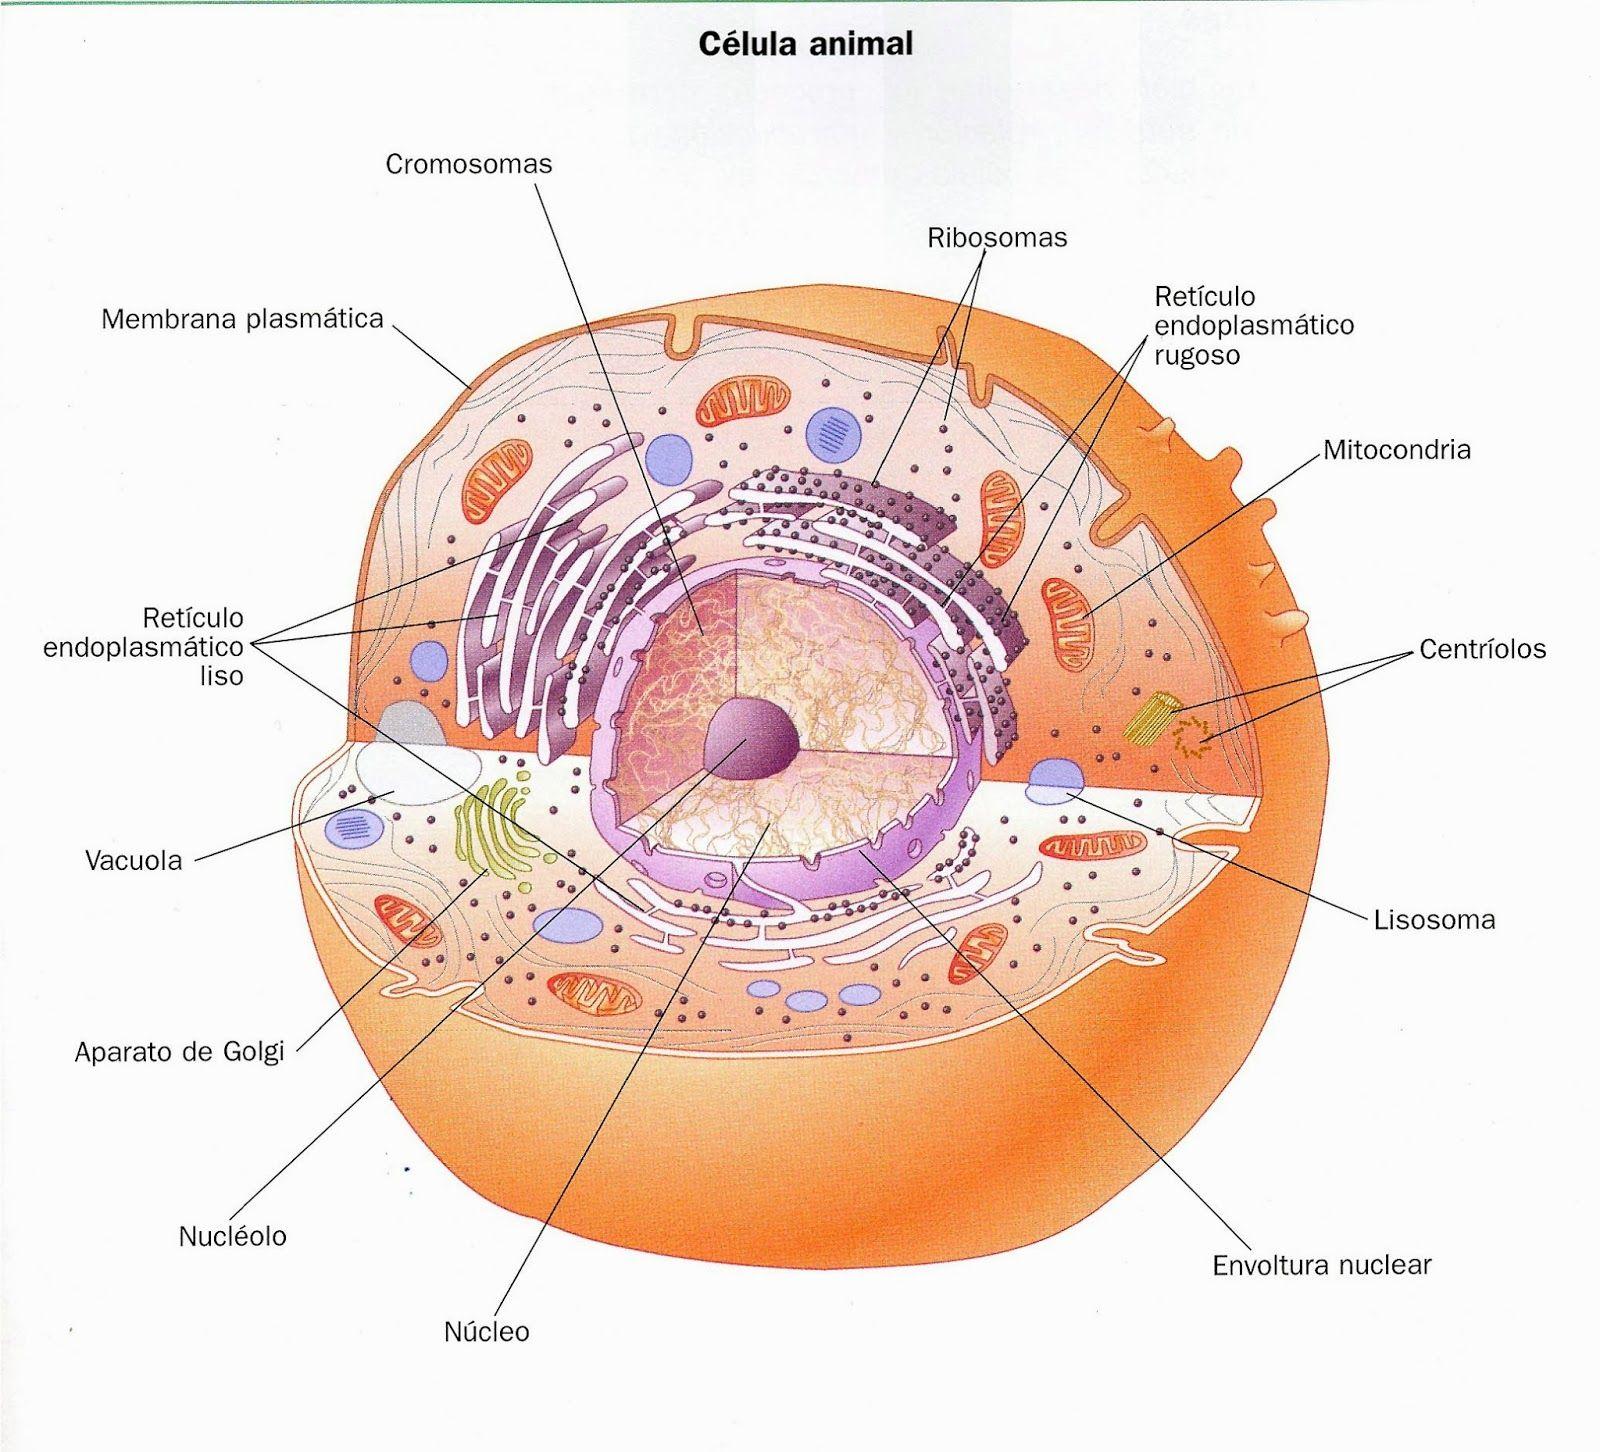 Celularízate Estructura De Las Células Eucariota Y